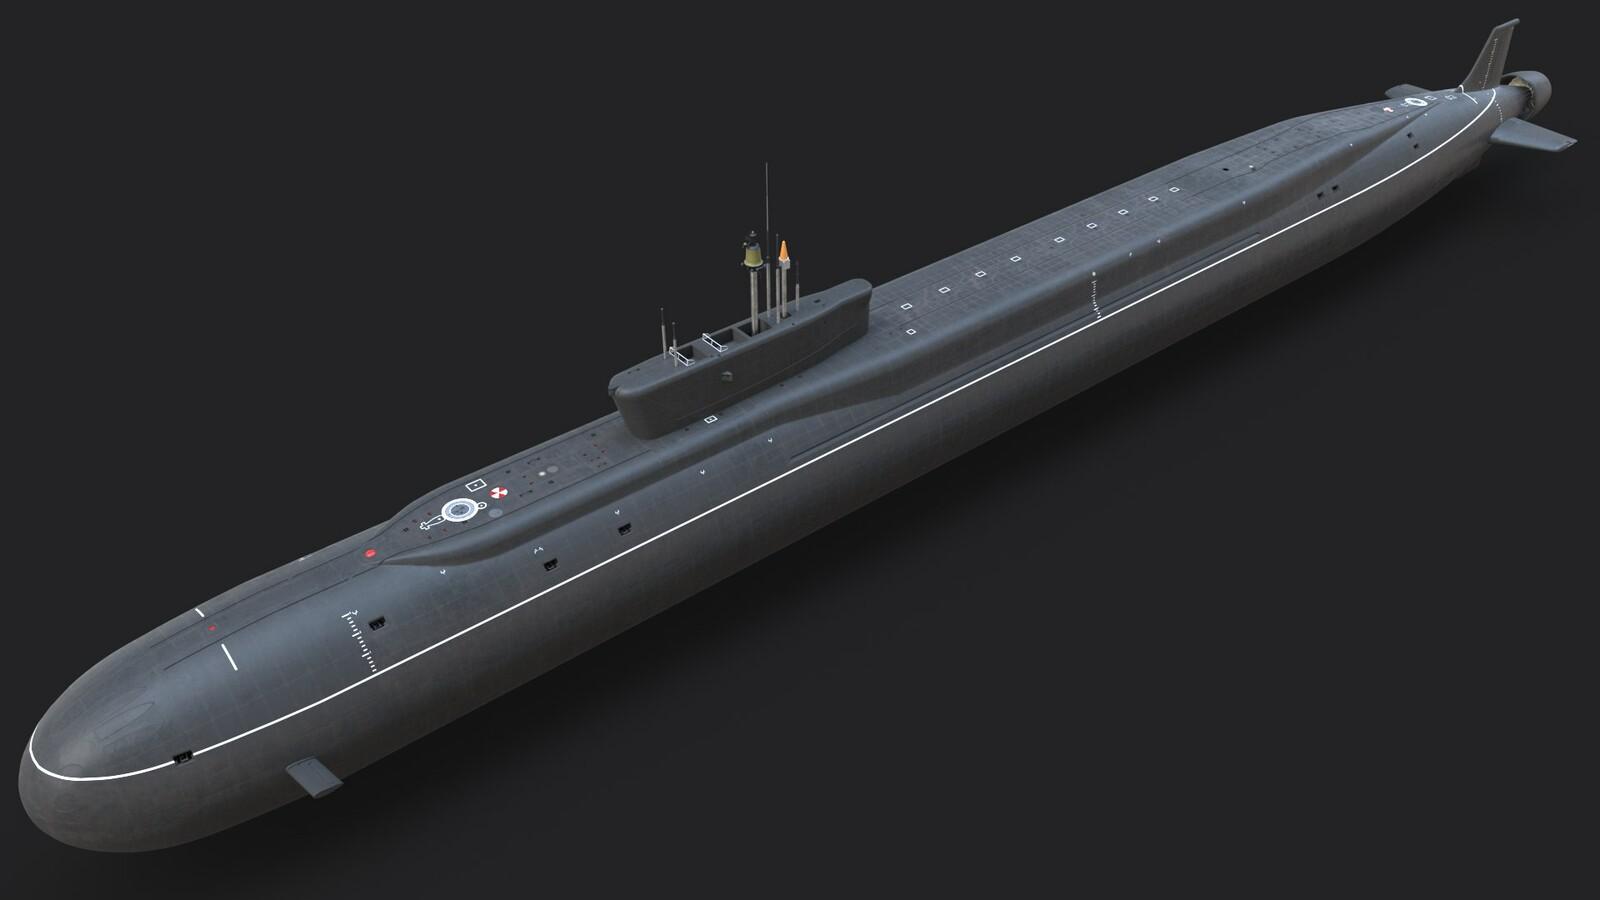 Project 955 Borei Class Submarine